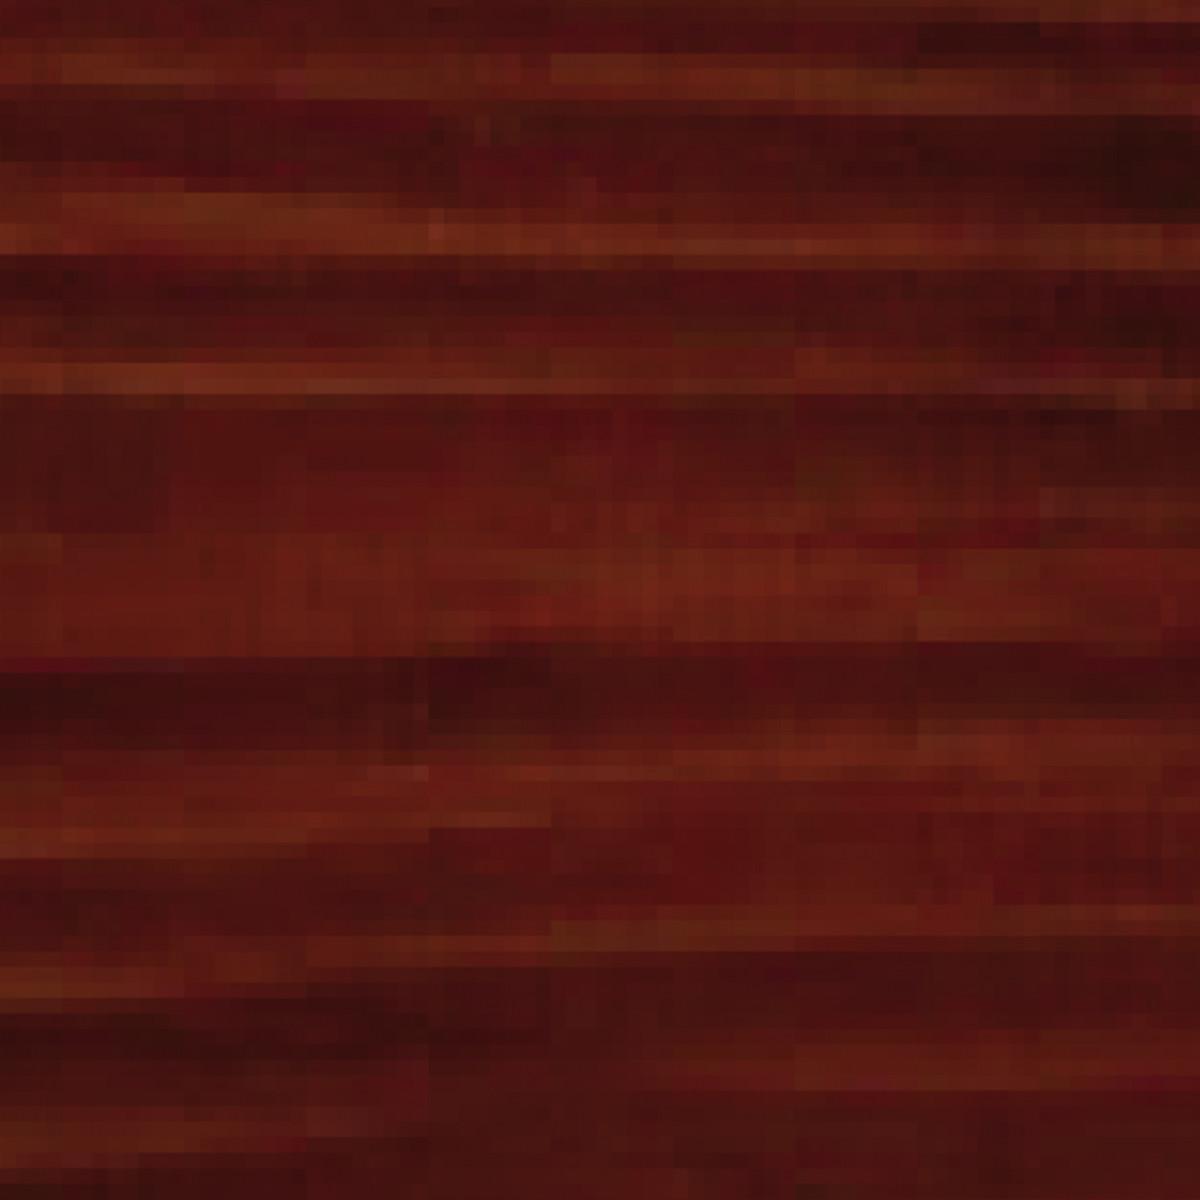 V33 vernici legno flatting imbarcazioni prezzi for Vernici leroy merlin